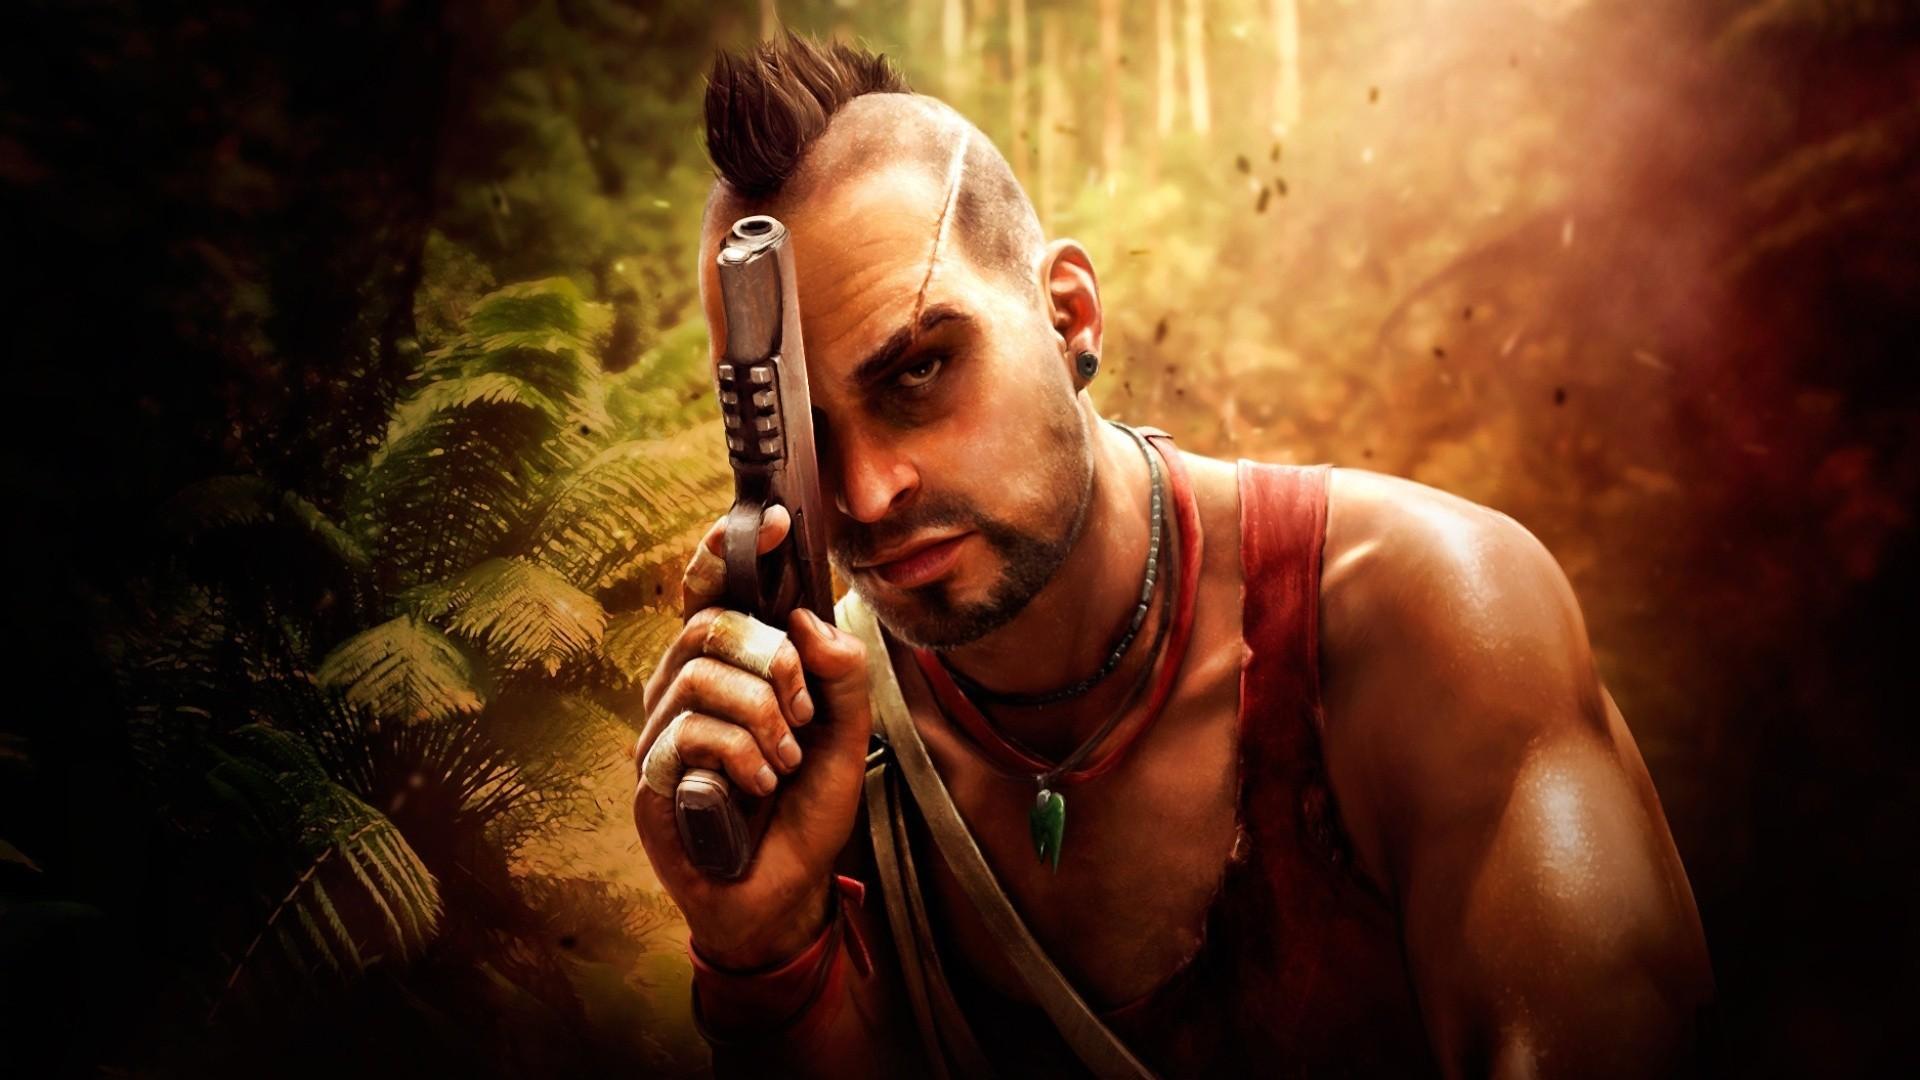 Wallpaper Video Games Mythology Far Cry Far Cry 3 Vaas